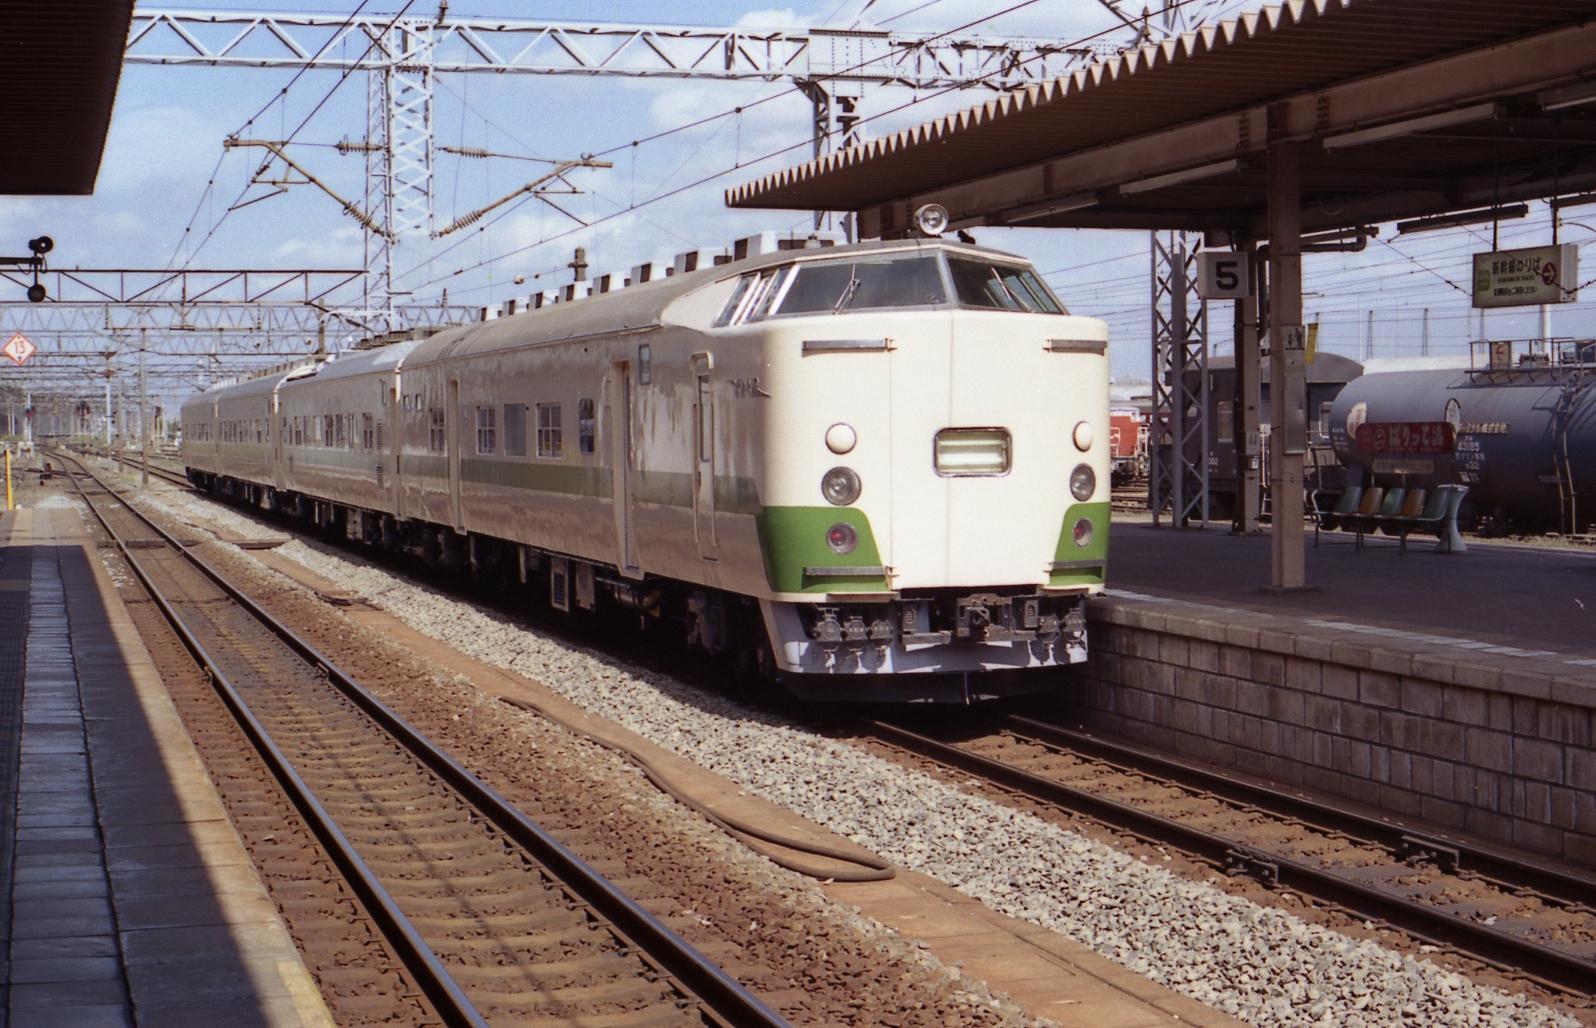 19840929a01